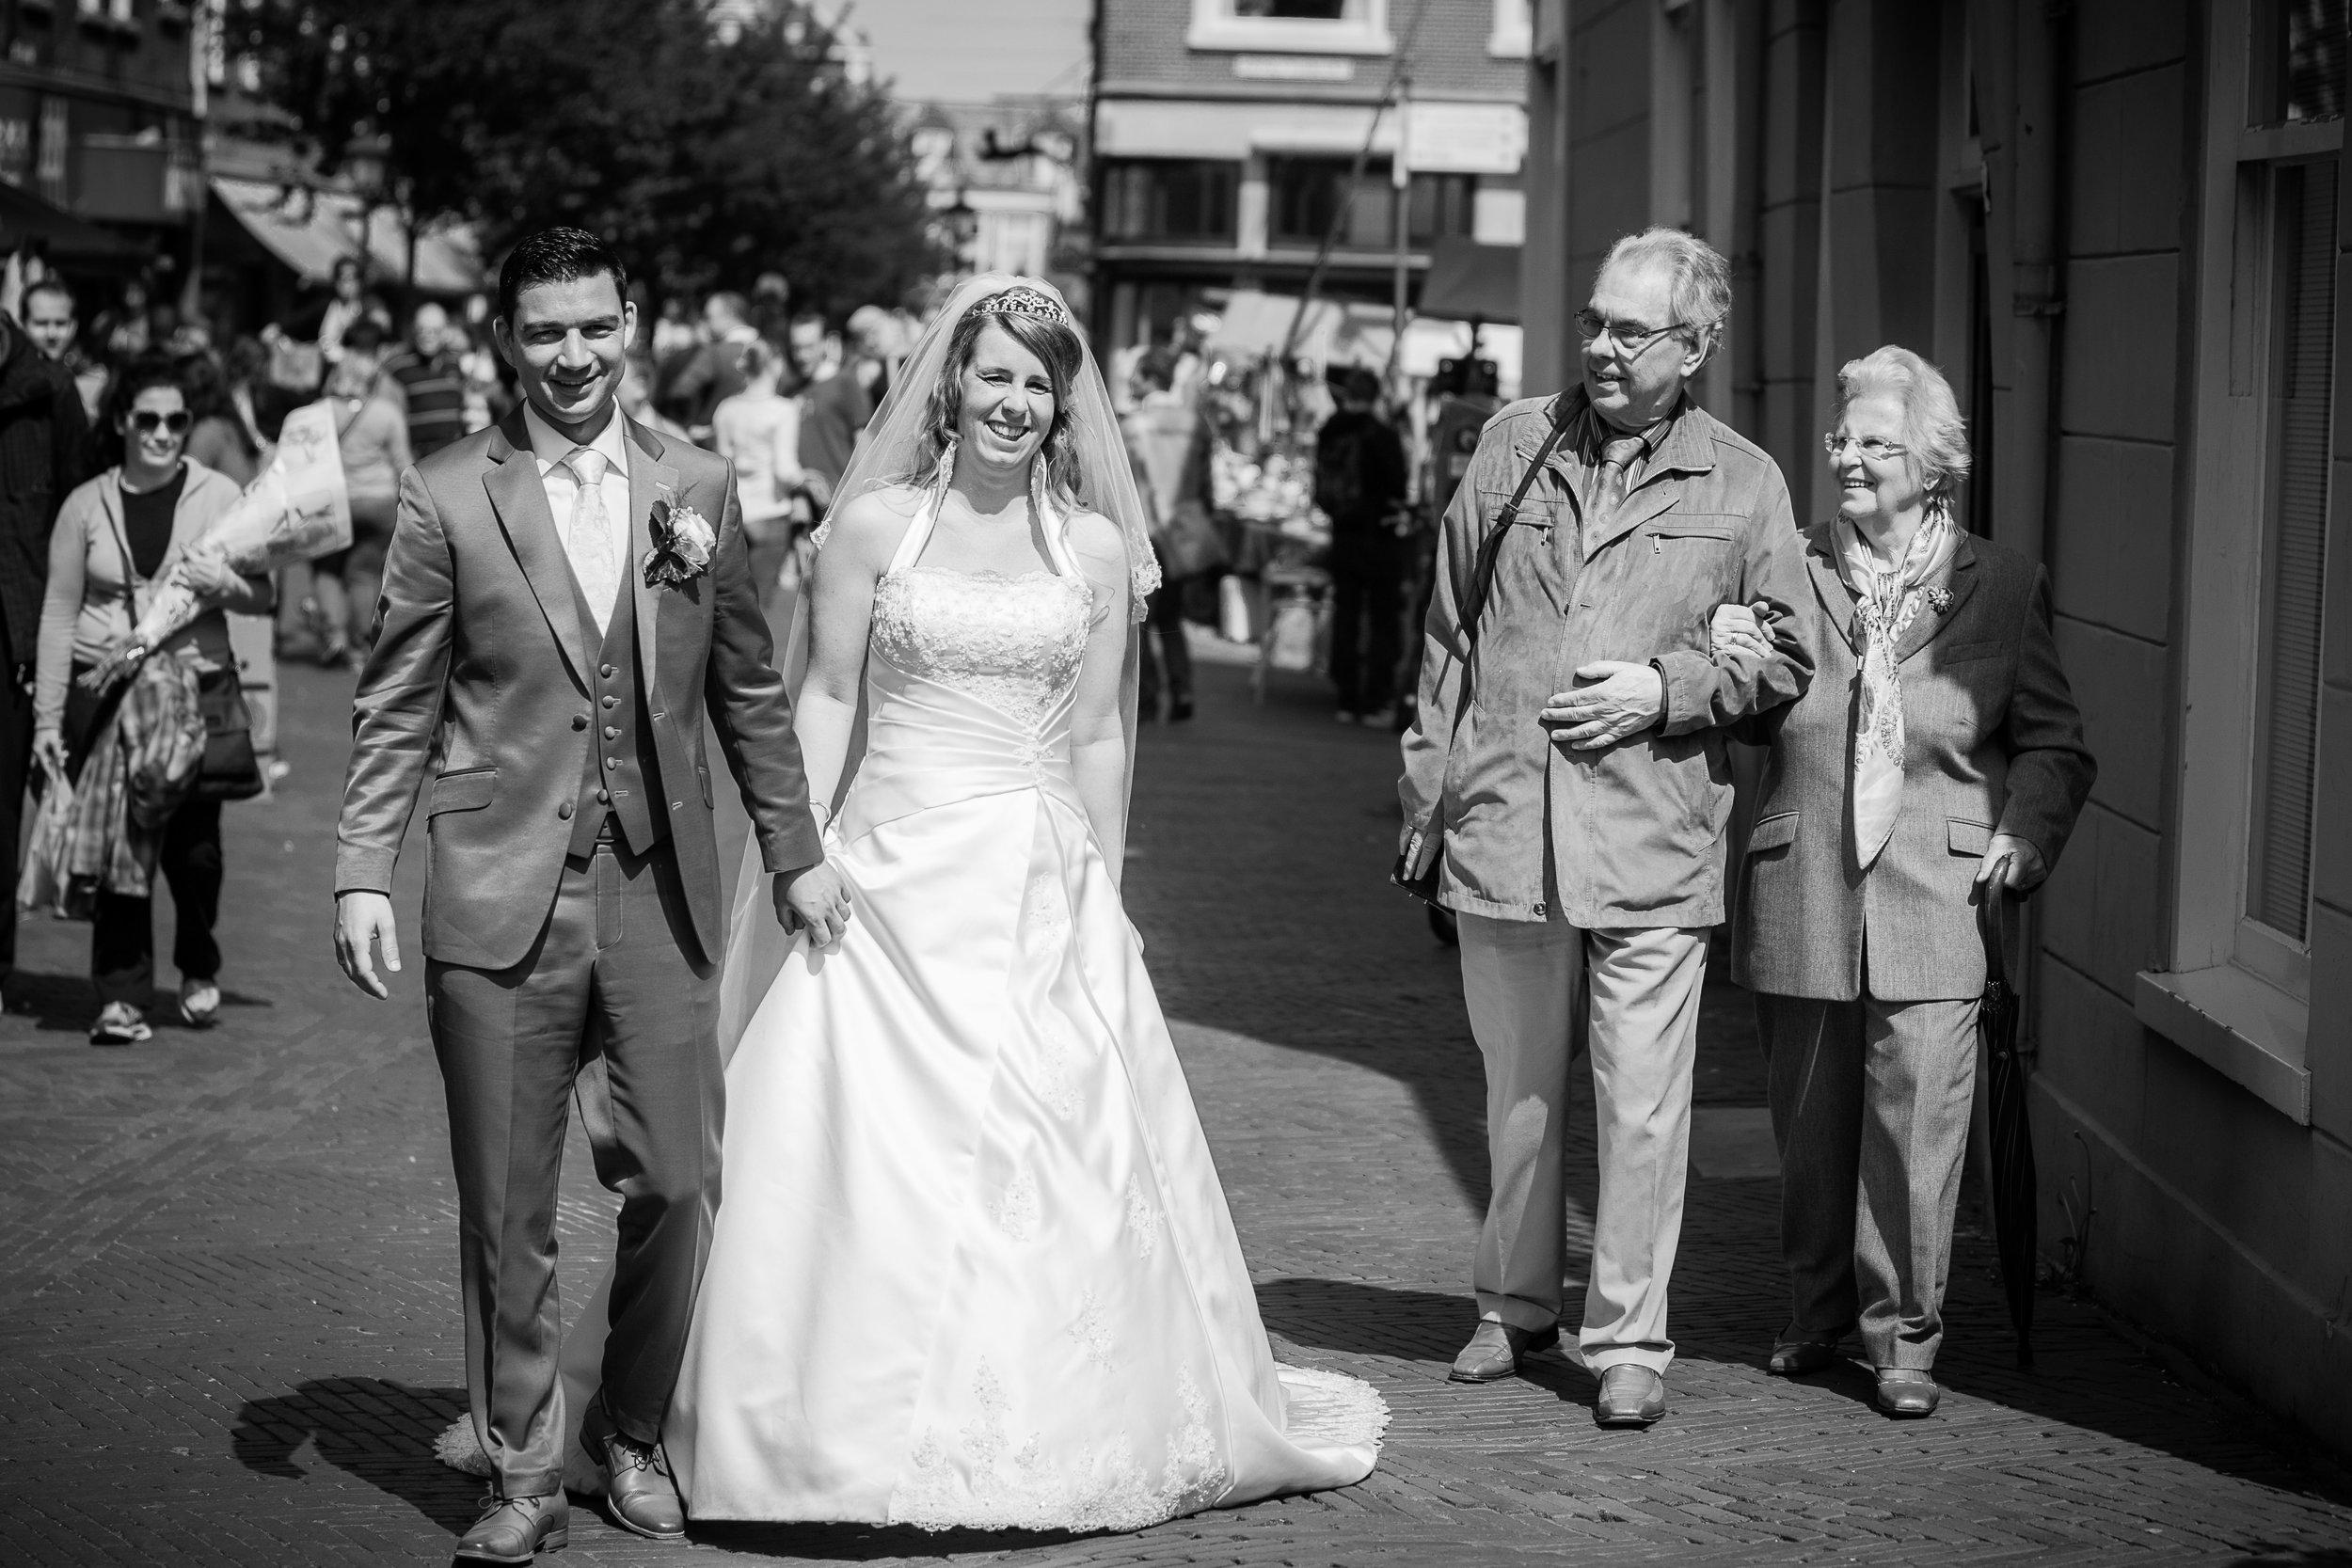 bruidsfotografie-trouwreportage-huwelijksfotografie-bruidsfotograaf-feestfotografie-Anouk en Edgar-75.jpg